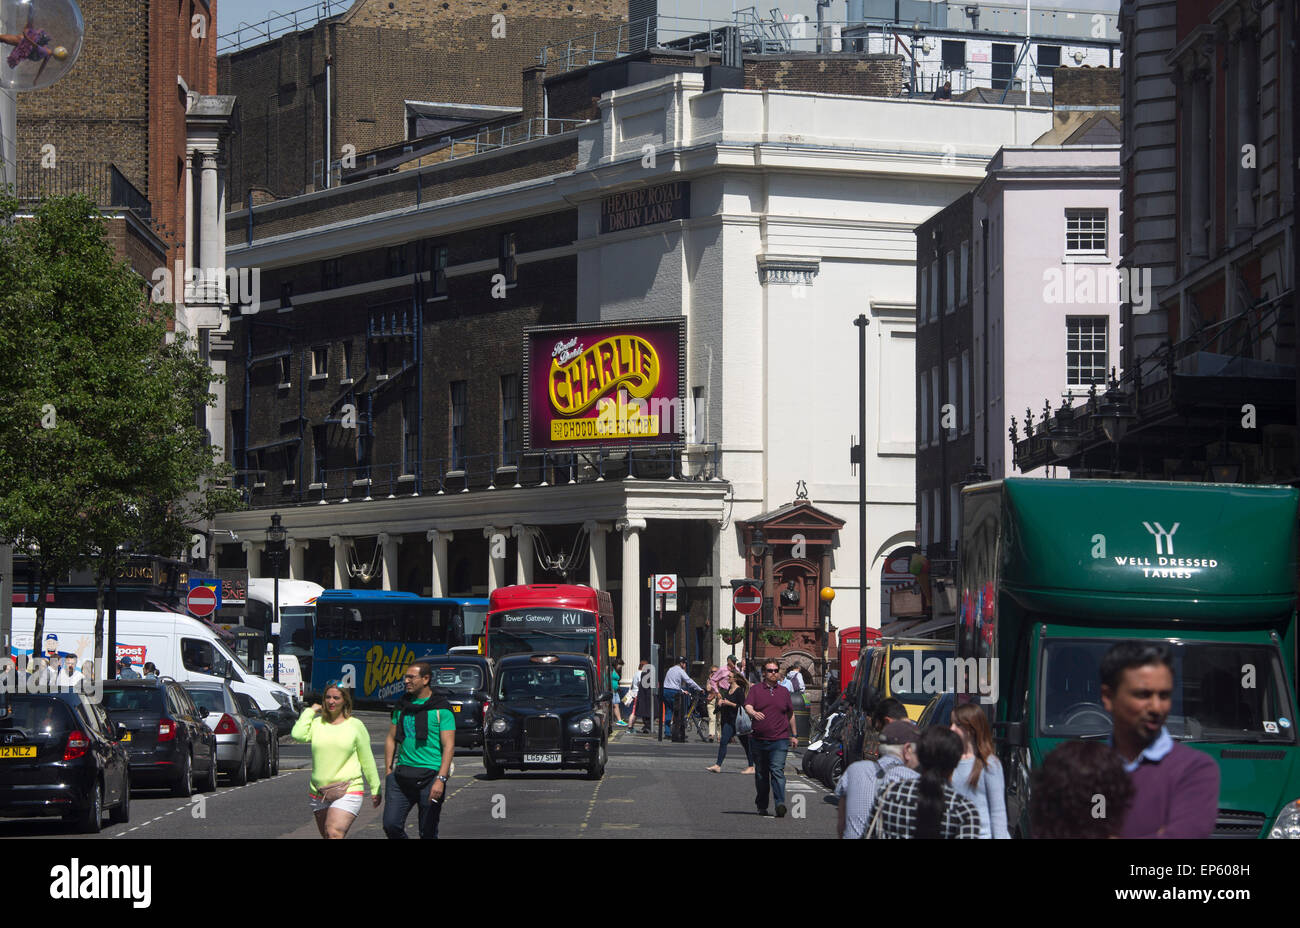 Theatre Royal, Drury Lane, playhouse - Stock Image